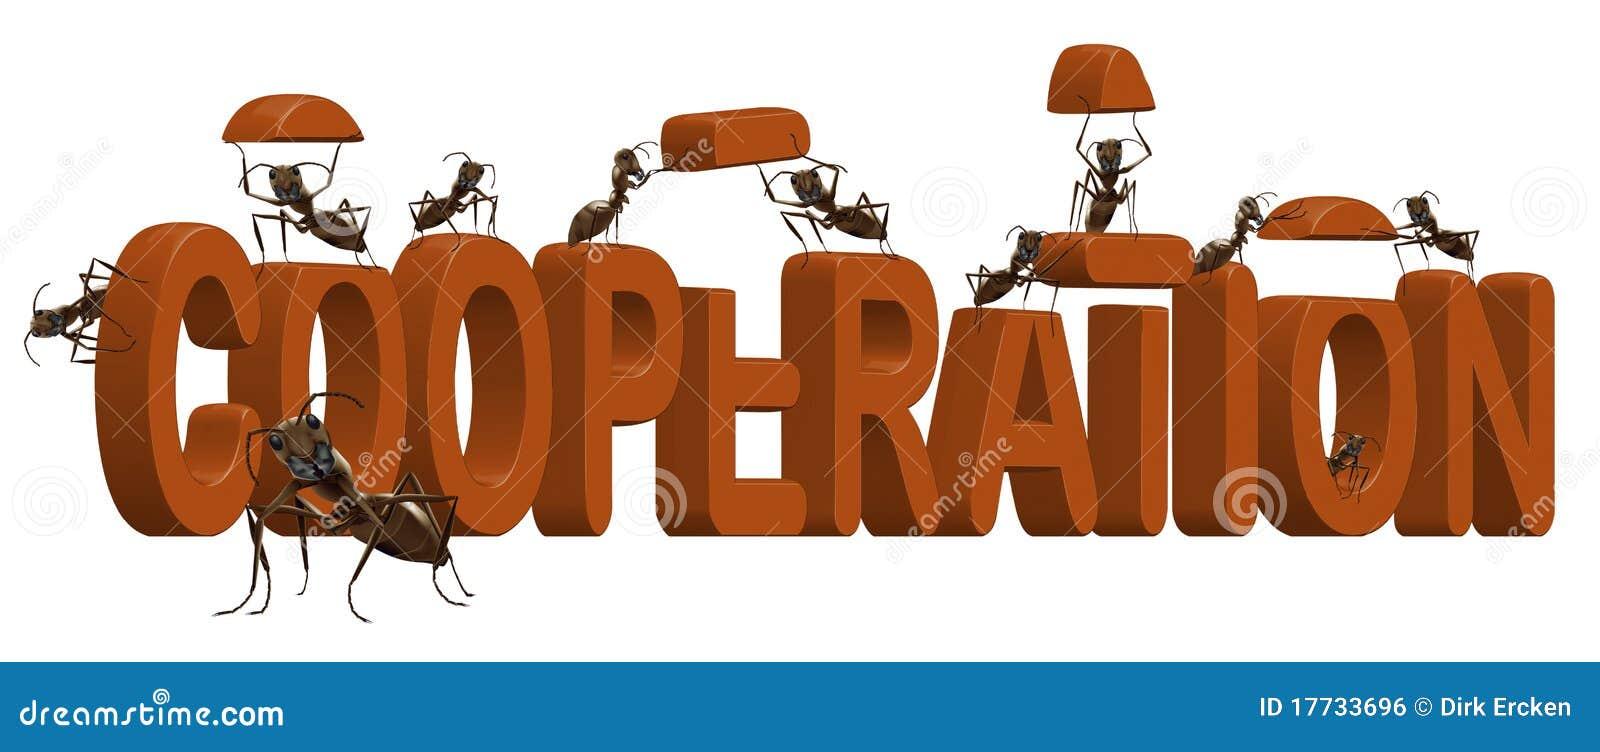 Cooperation teamwork and team spirit cooperate